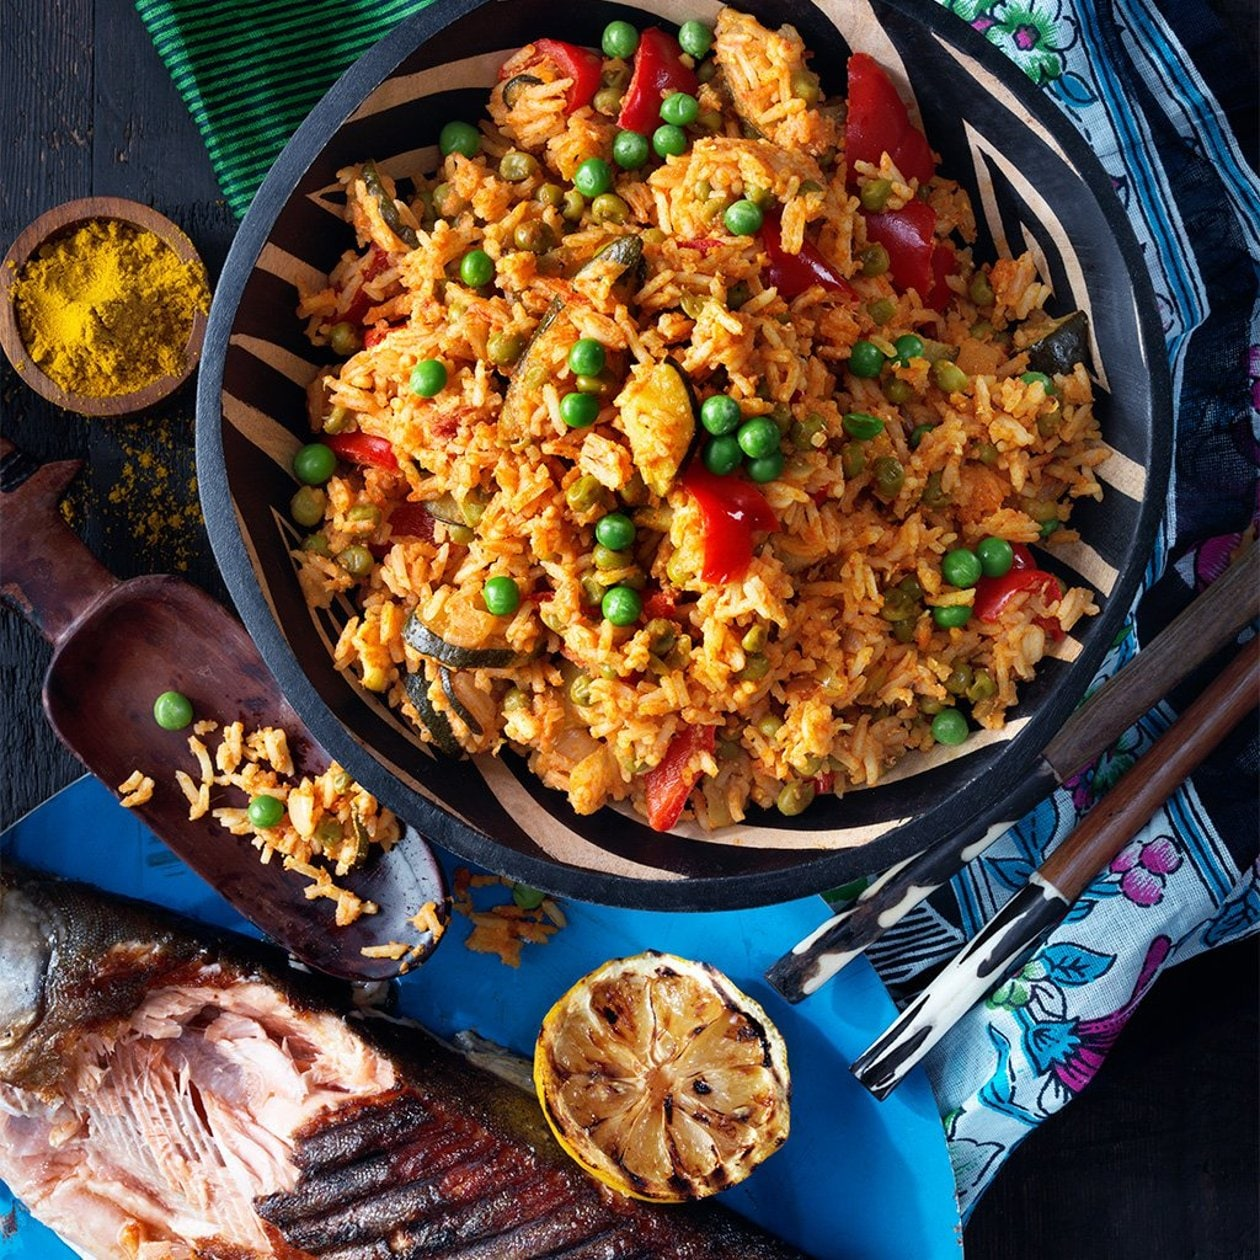 Wali wa Kukaanga – Kenialainen paistettu riisi – Resepti